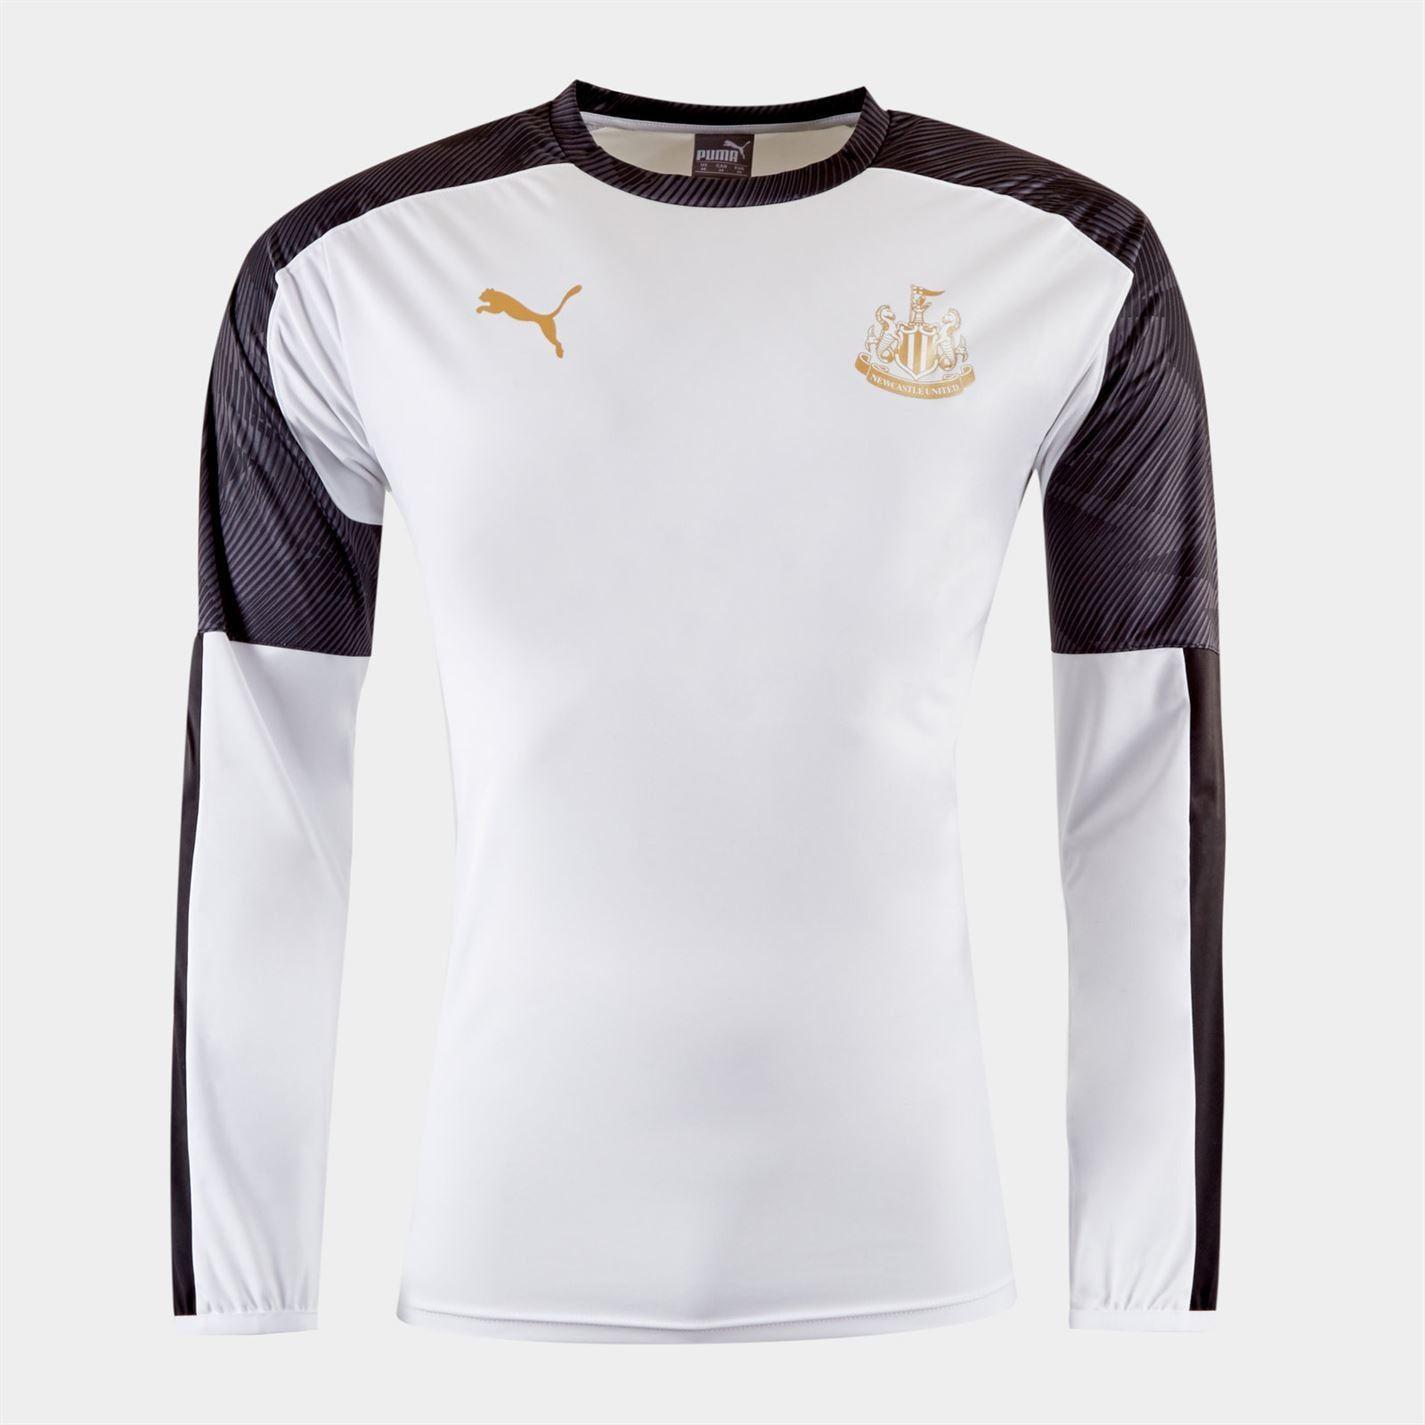 Puma-Newcastle-United-T-Shirt-Junior-Football-Boys-Soccer-Fan-Jersey-Drill-Top thumbnail 8